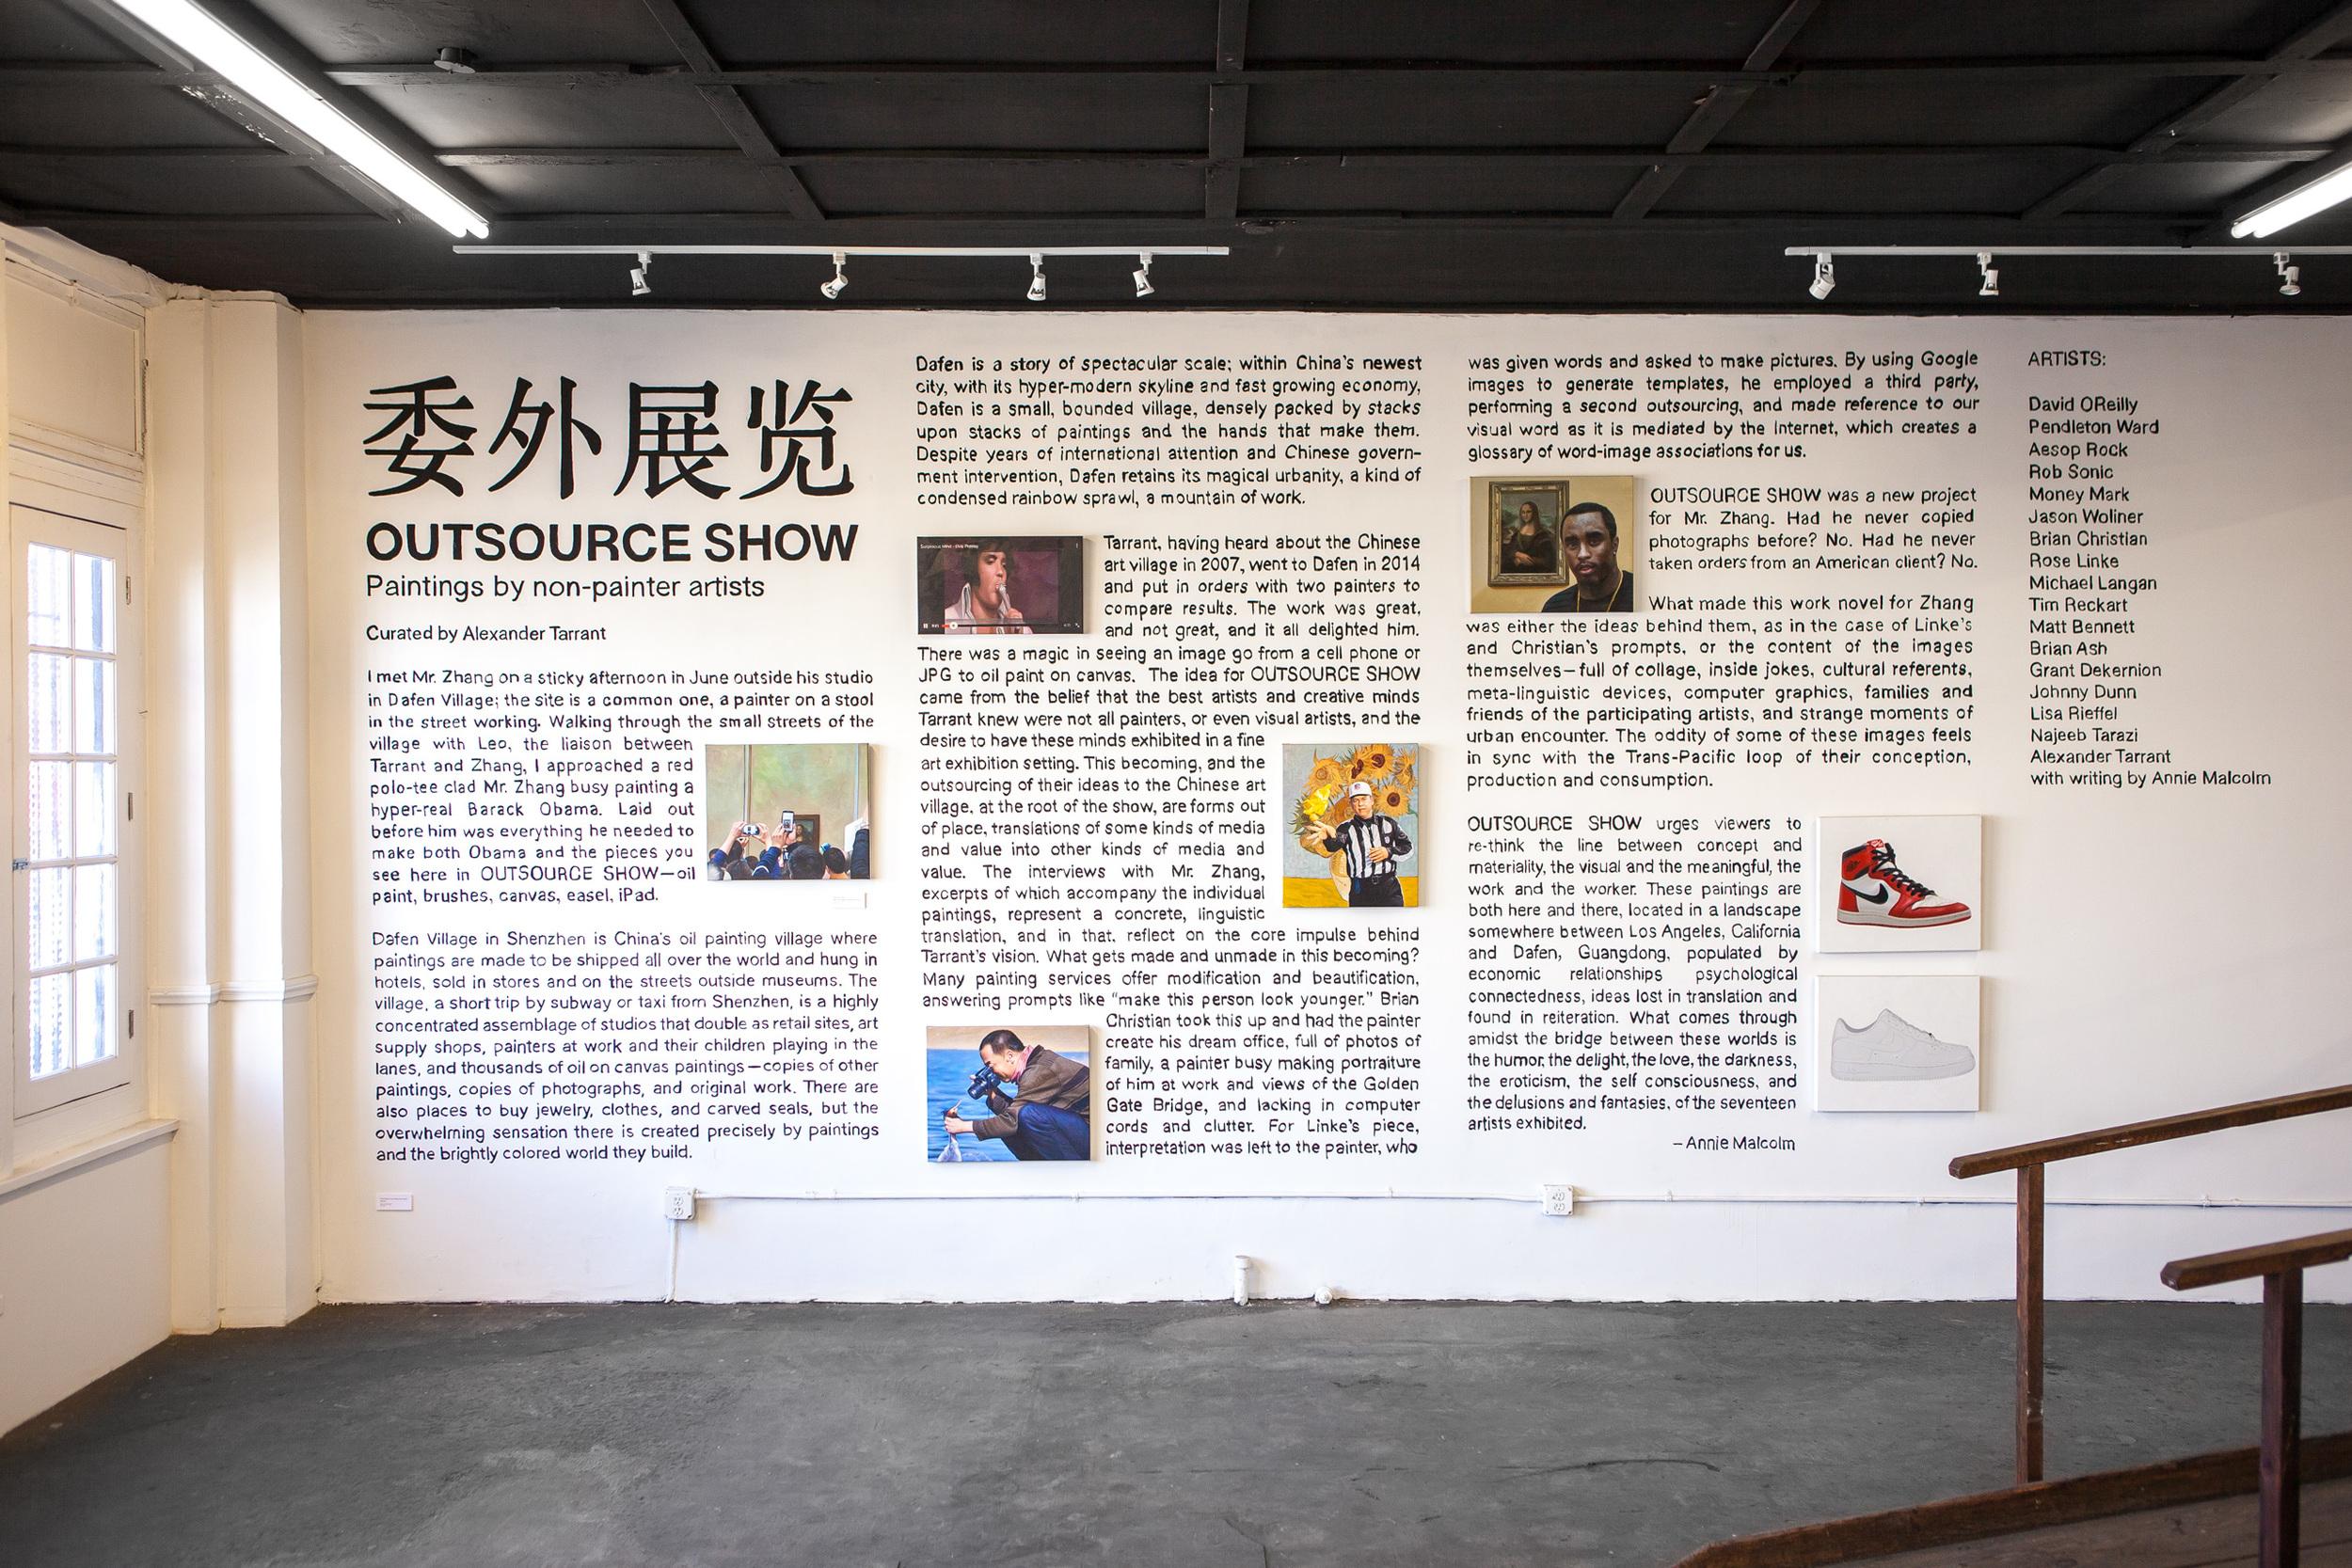 Outsource Show Exhibit Entry  Alexander Tarrant  Wall Text  Acrylic on Concrete via TaskRabbit, 2016